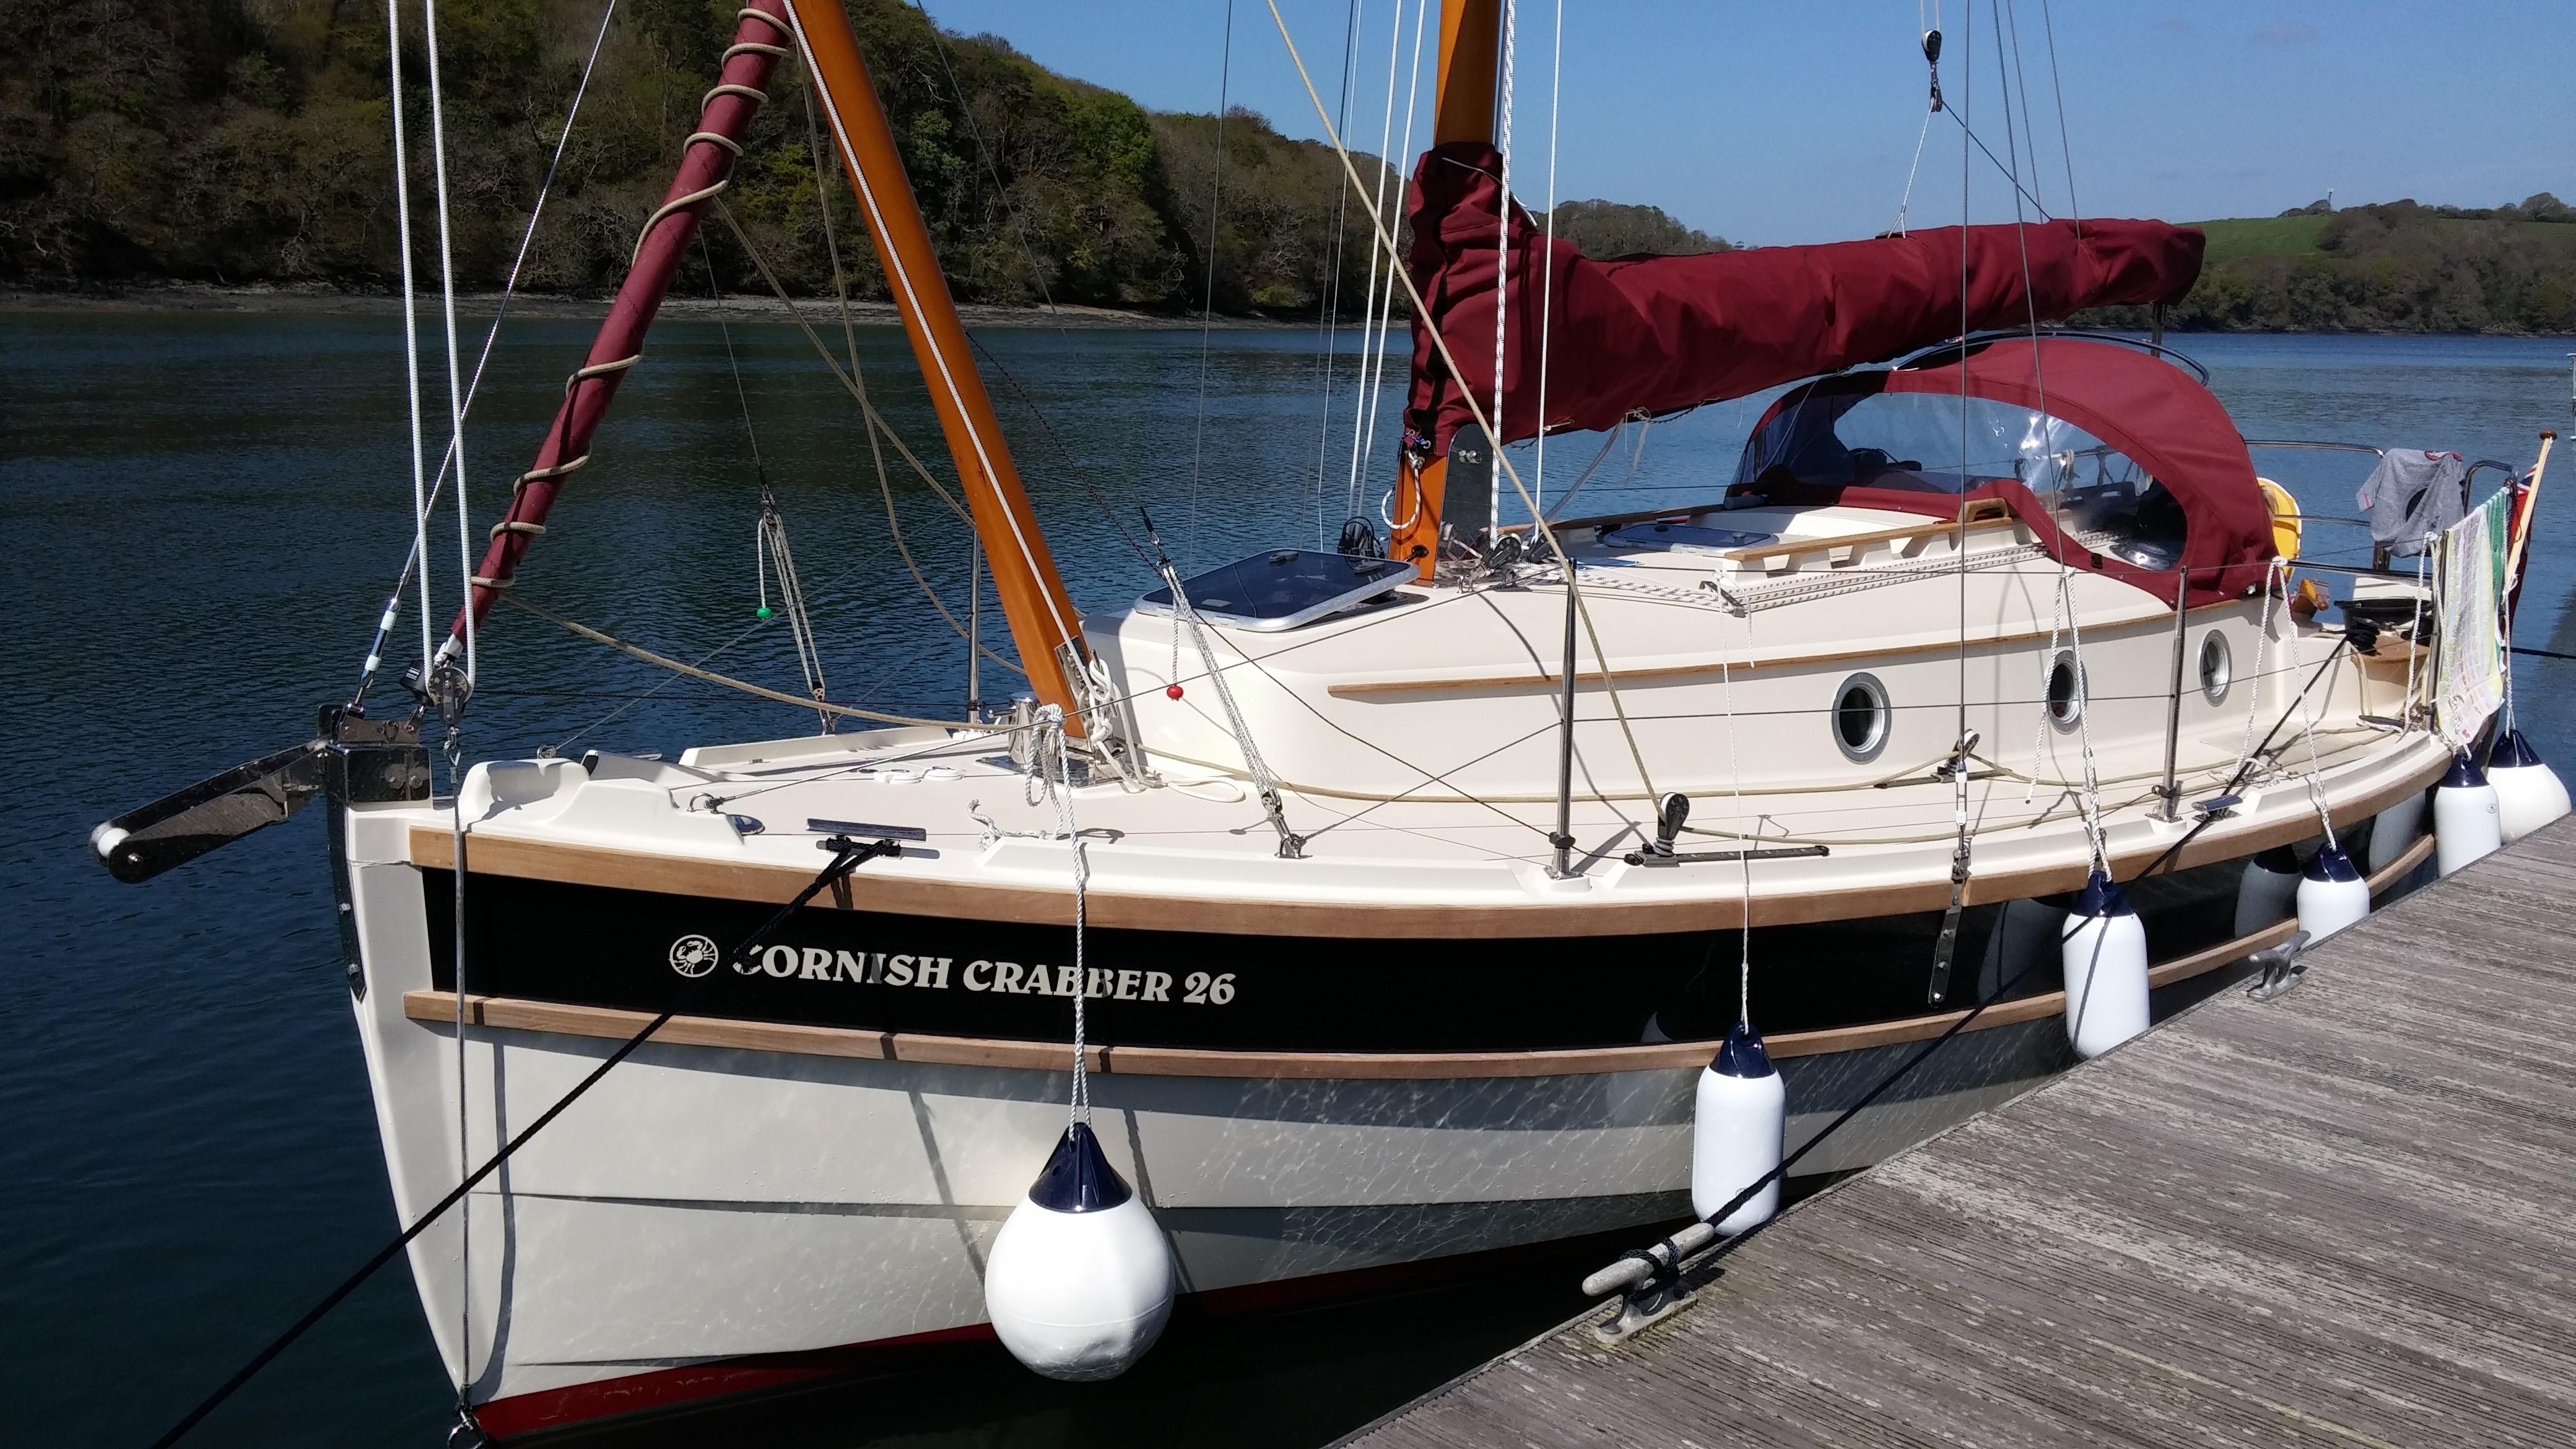 Cornish Crabber 26 Cornish Crabber 26